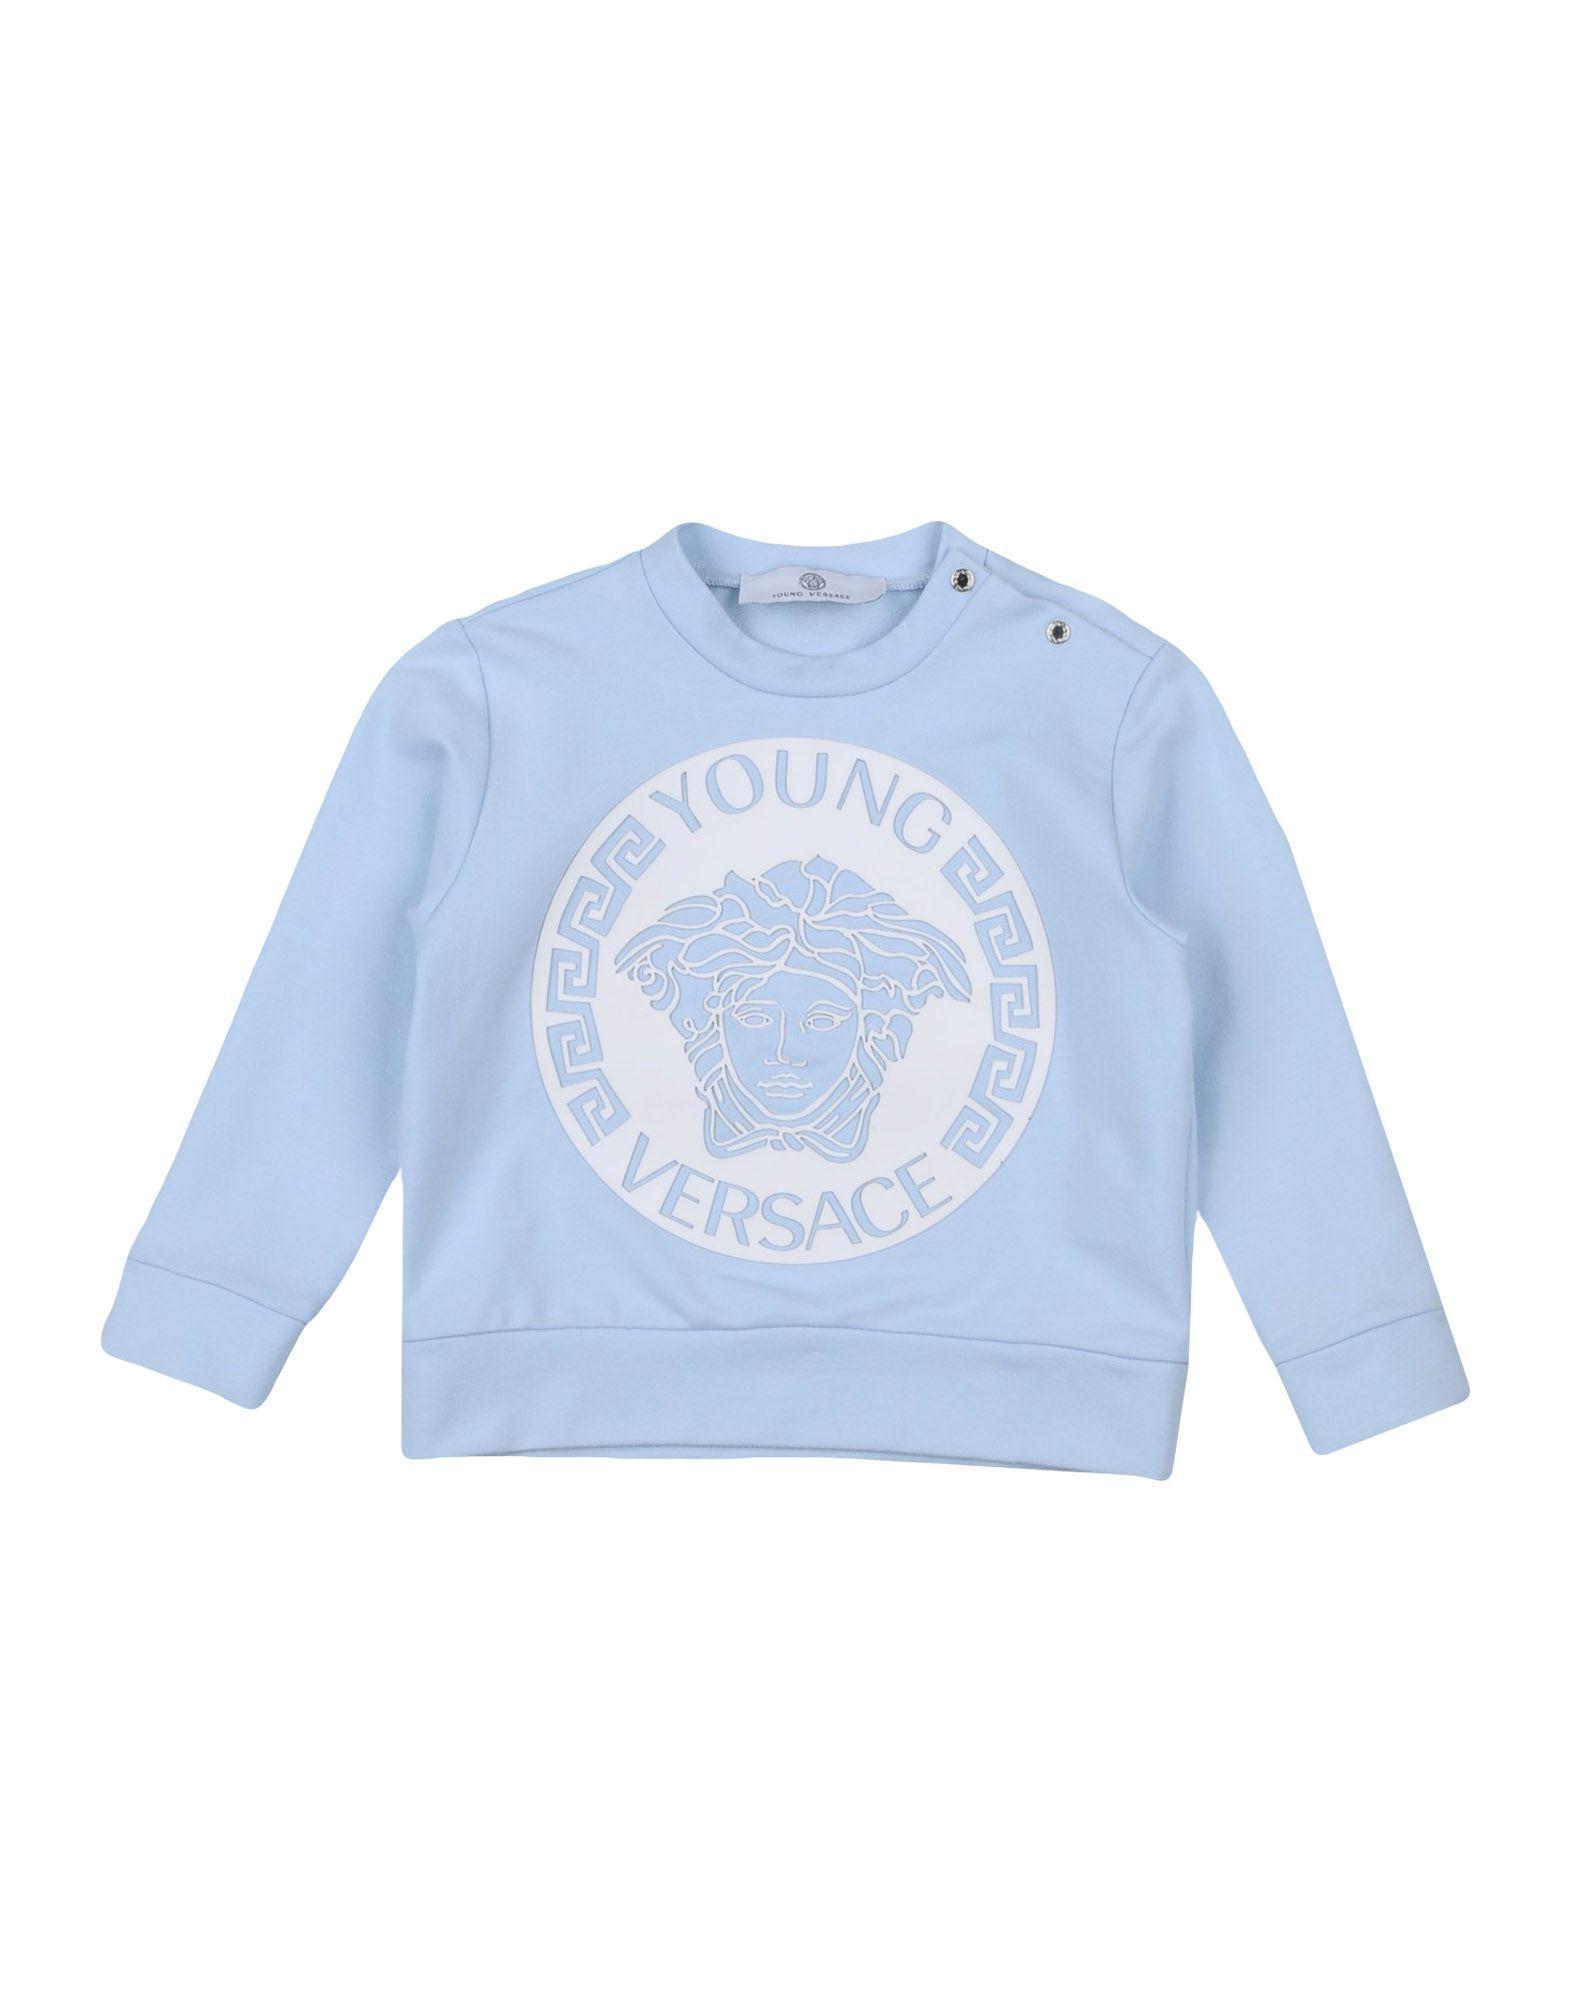 TOPWEAR Versace Young Sky blue Boy Cotton